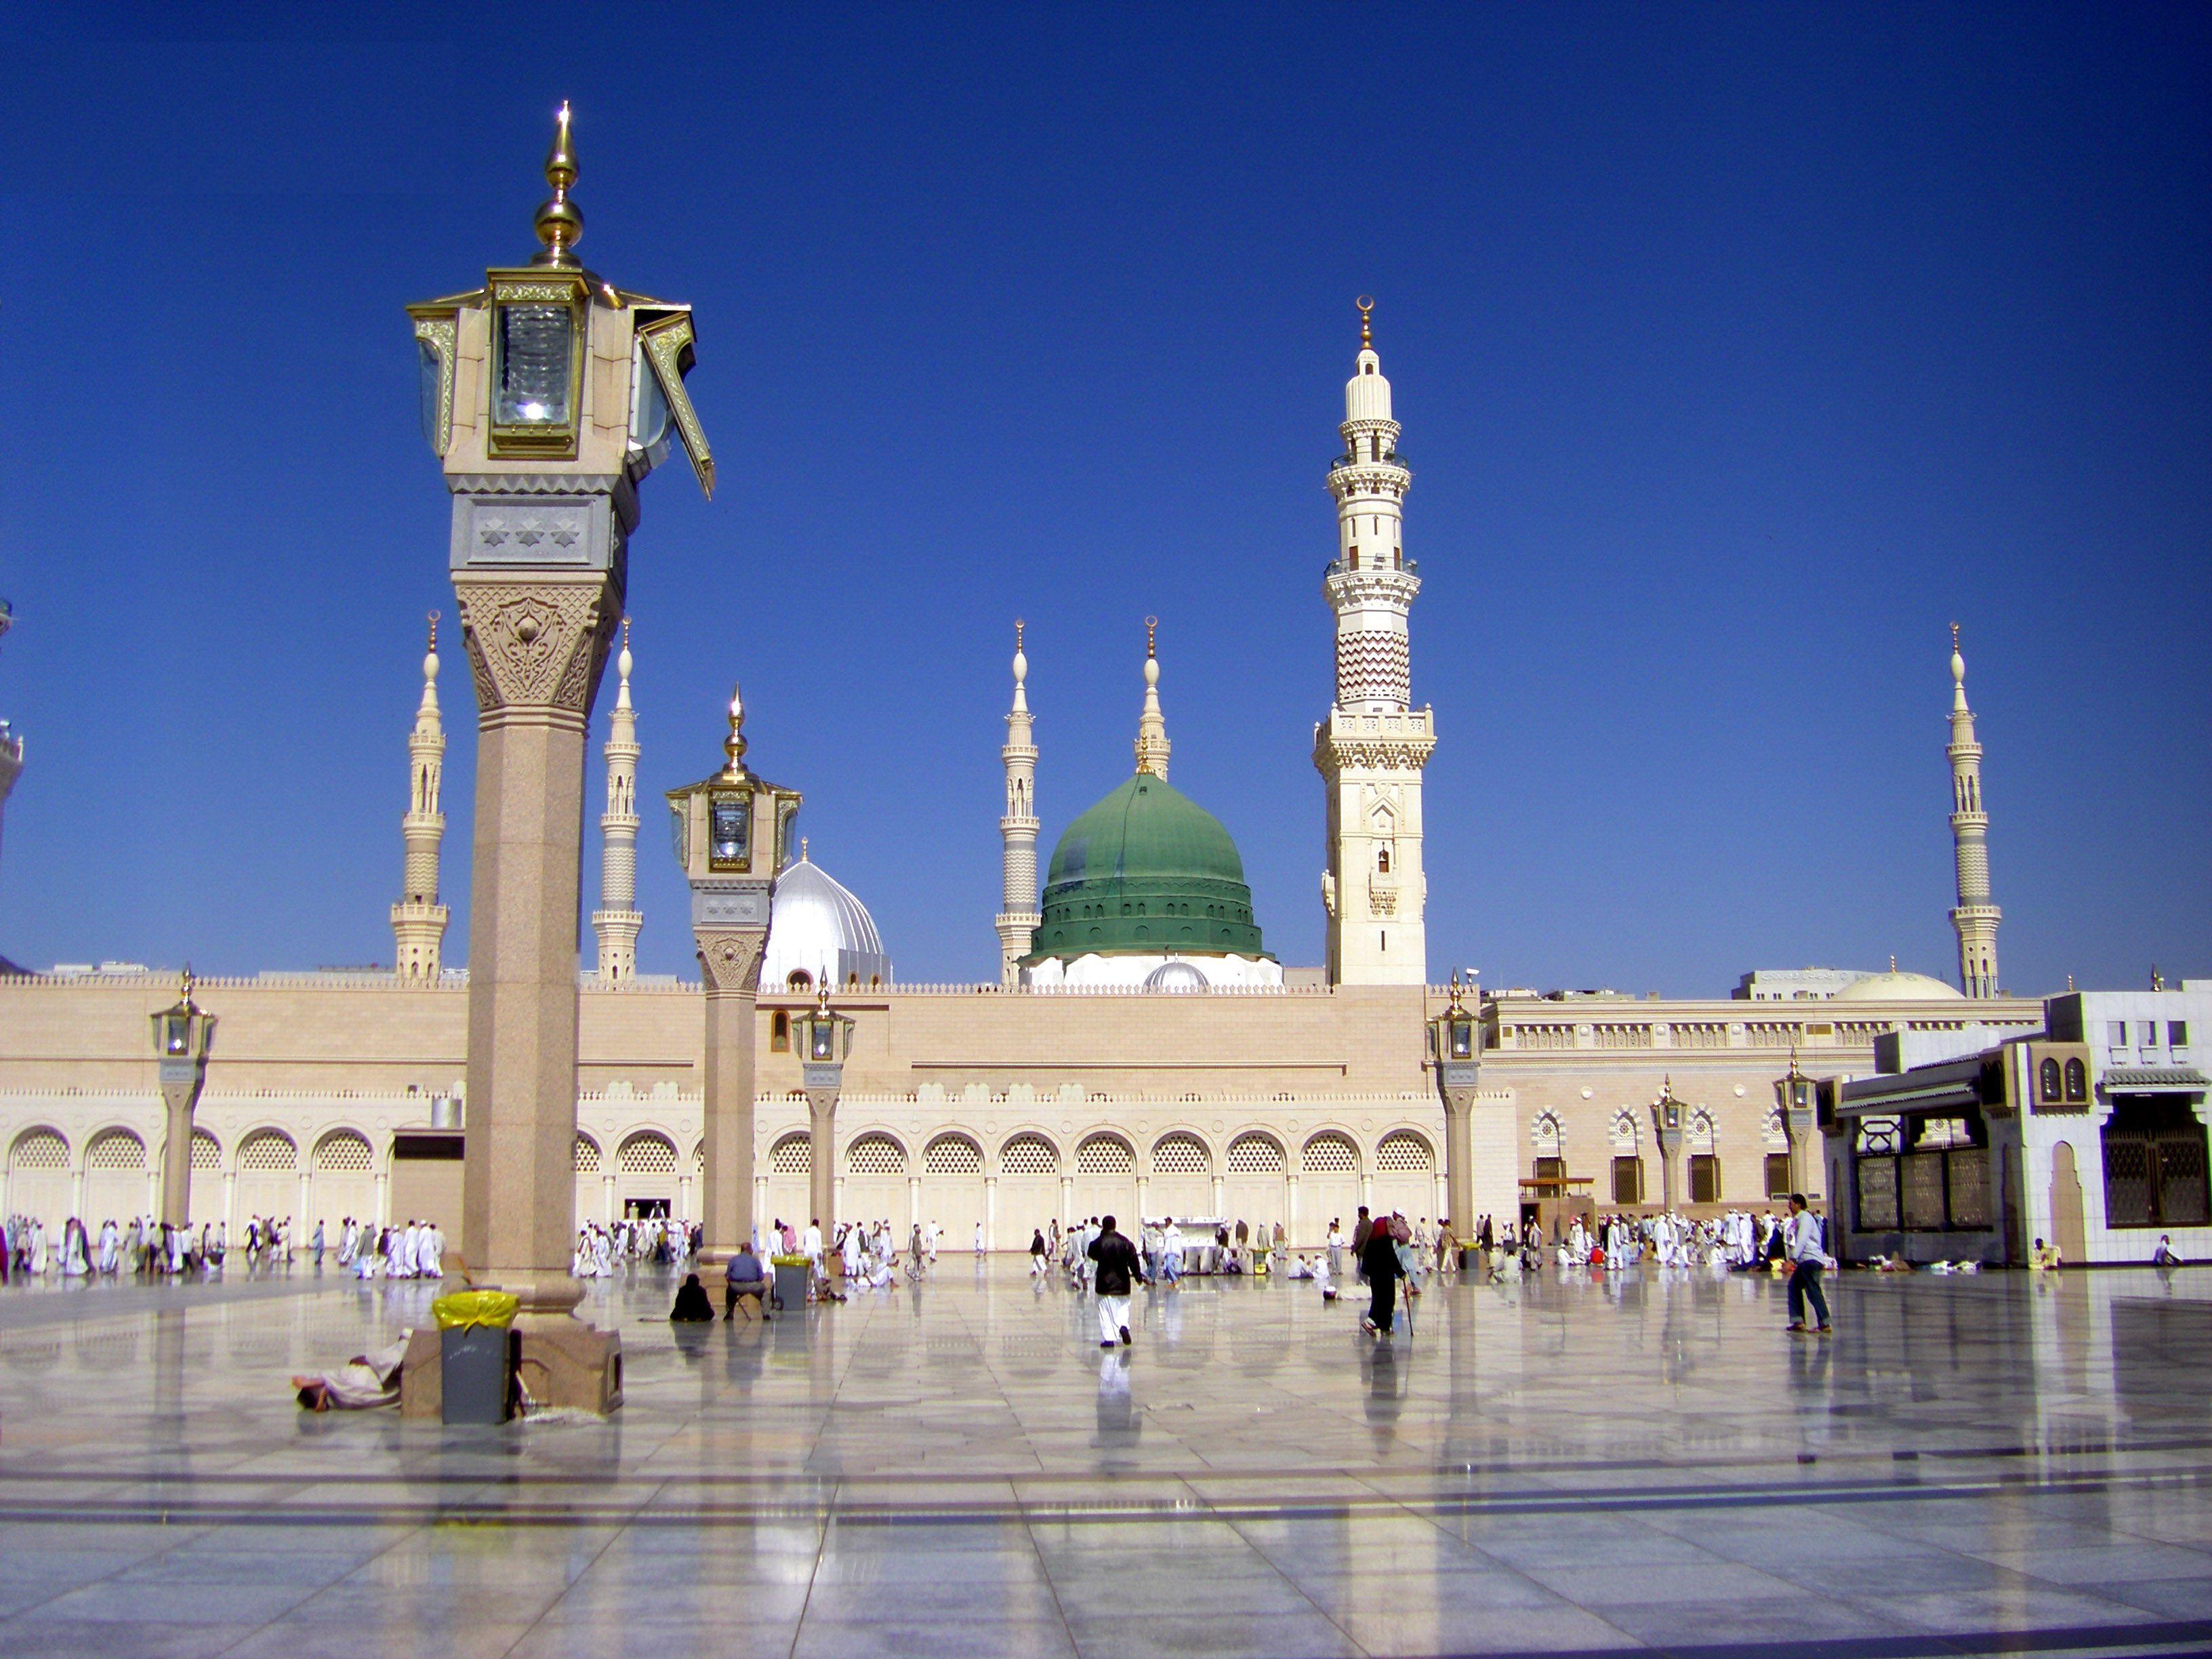 Al-Masjid an-Nabawi in Medina, Saudi Arabia  | Masjid